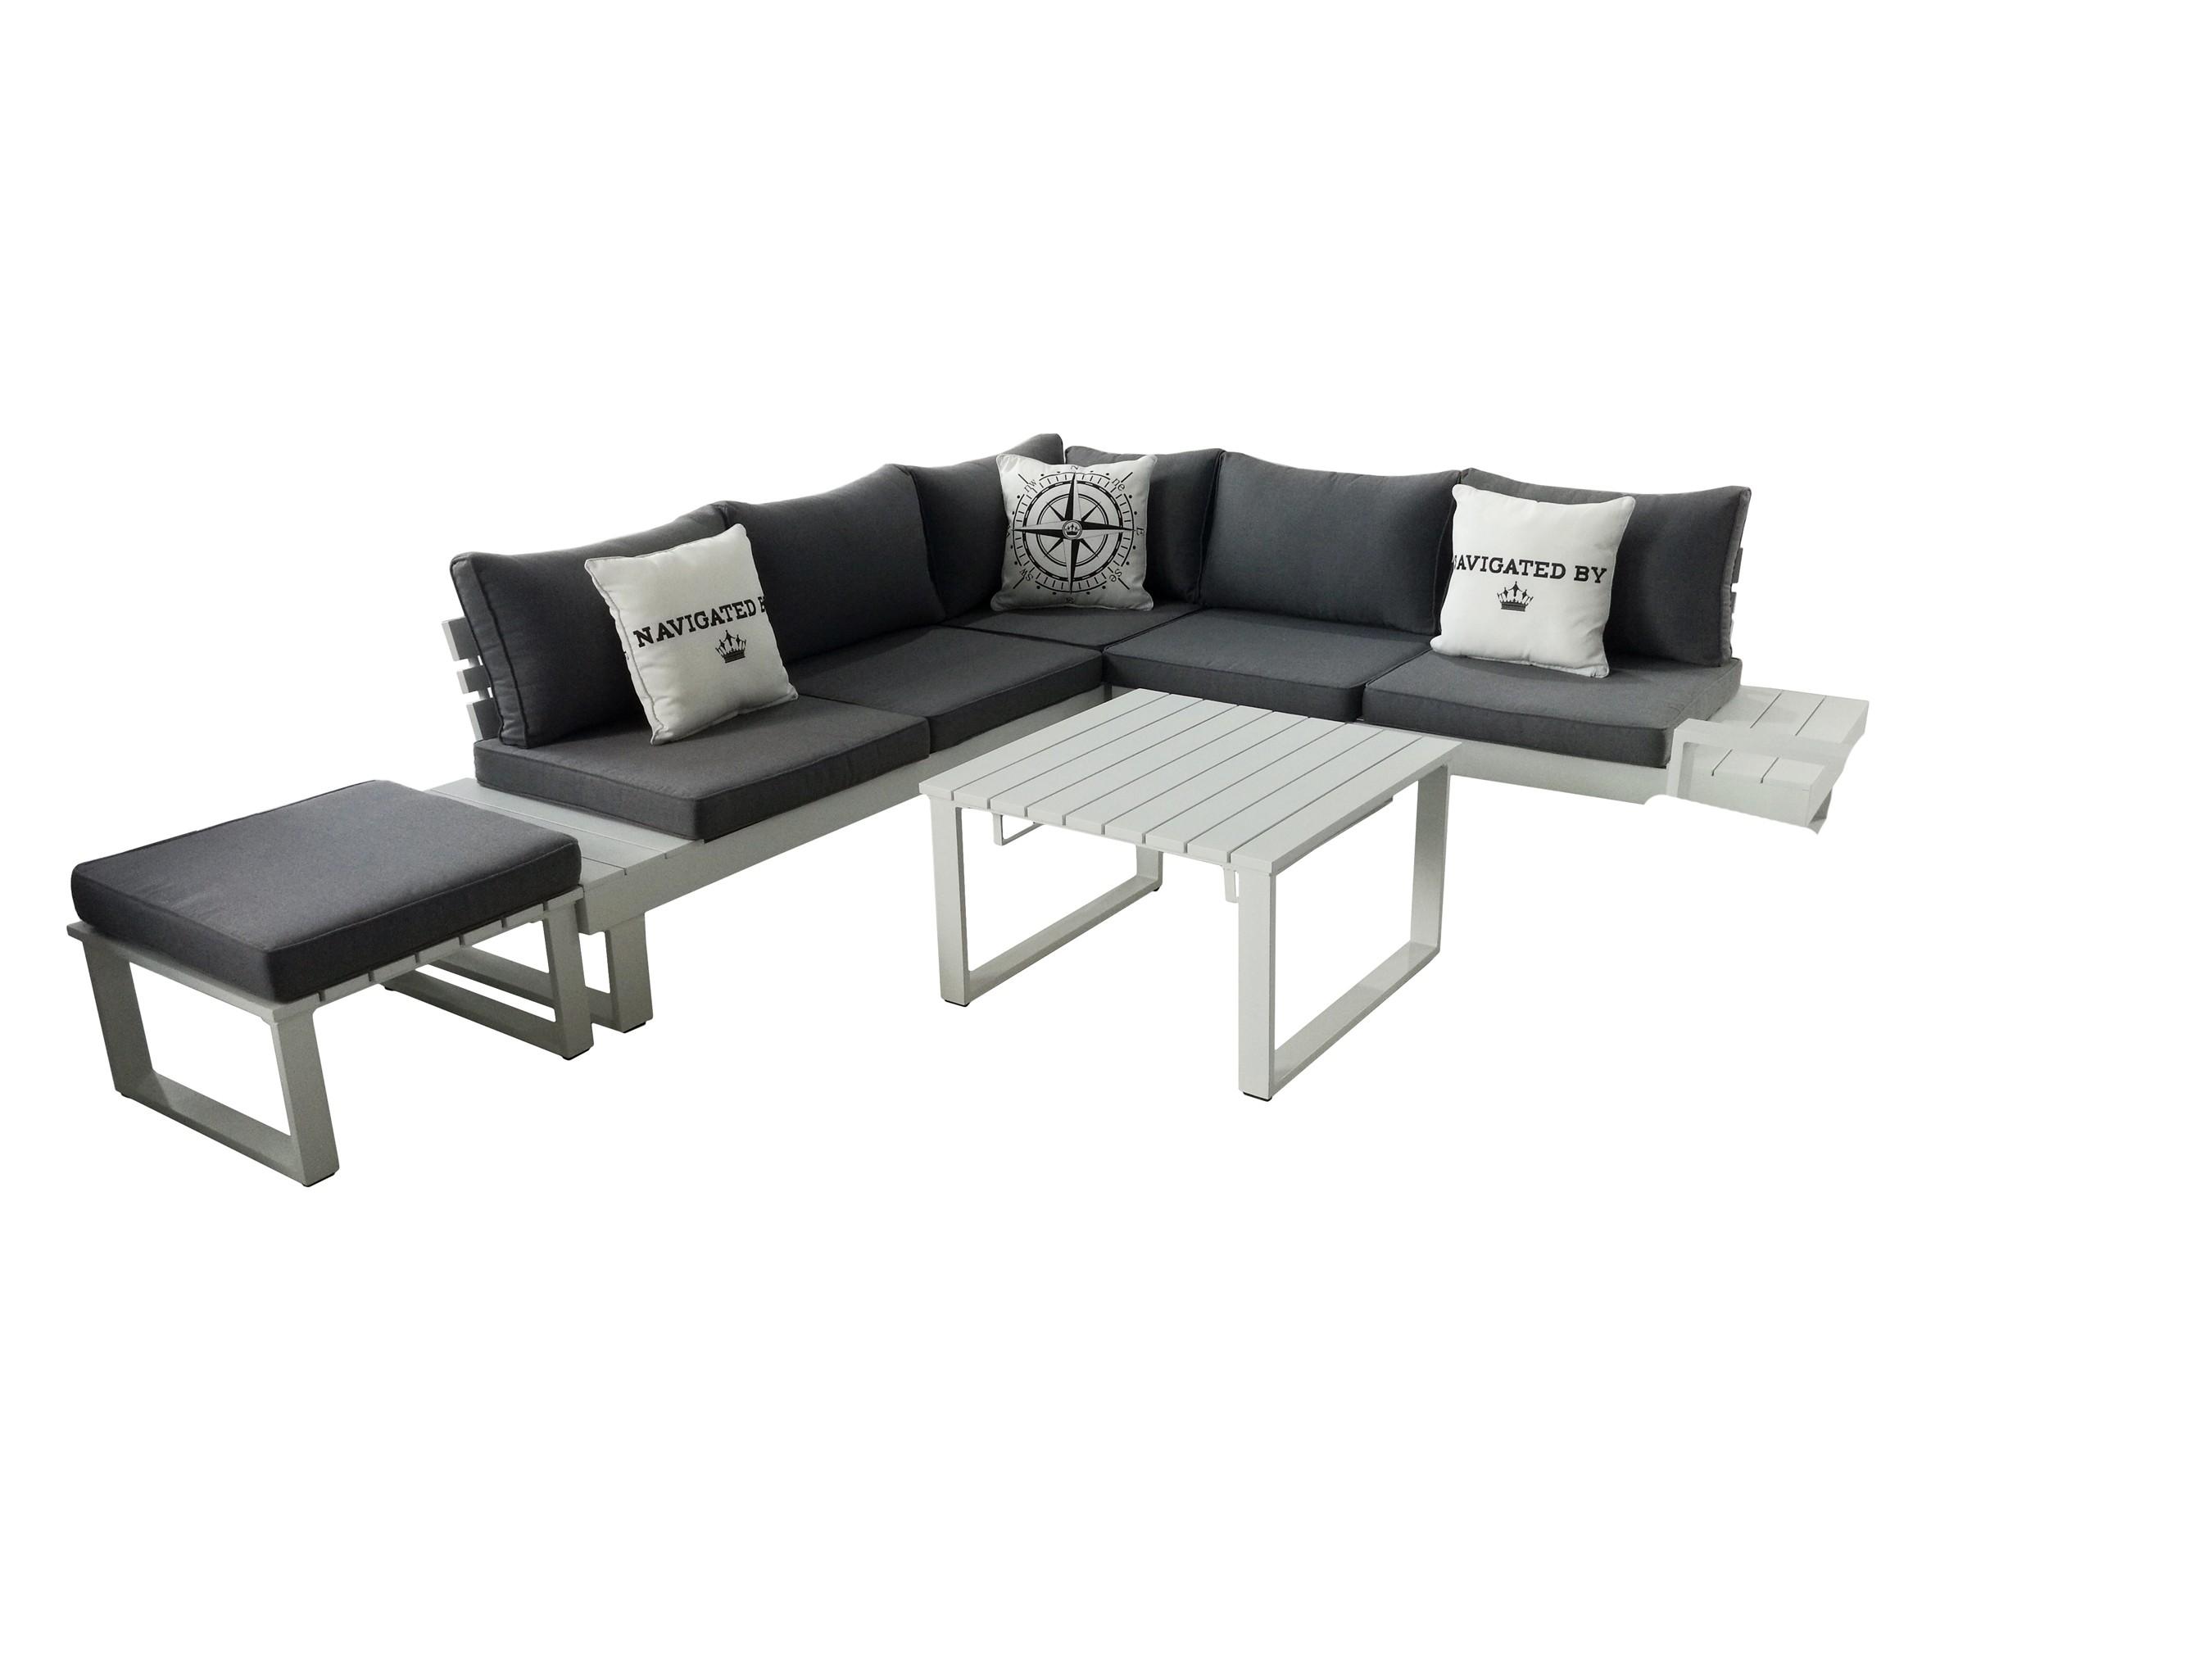 Sungörl Gartenmöbel / Lounge Set Baracoa Eck-Lounge Alu graphit 5 ...